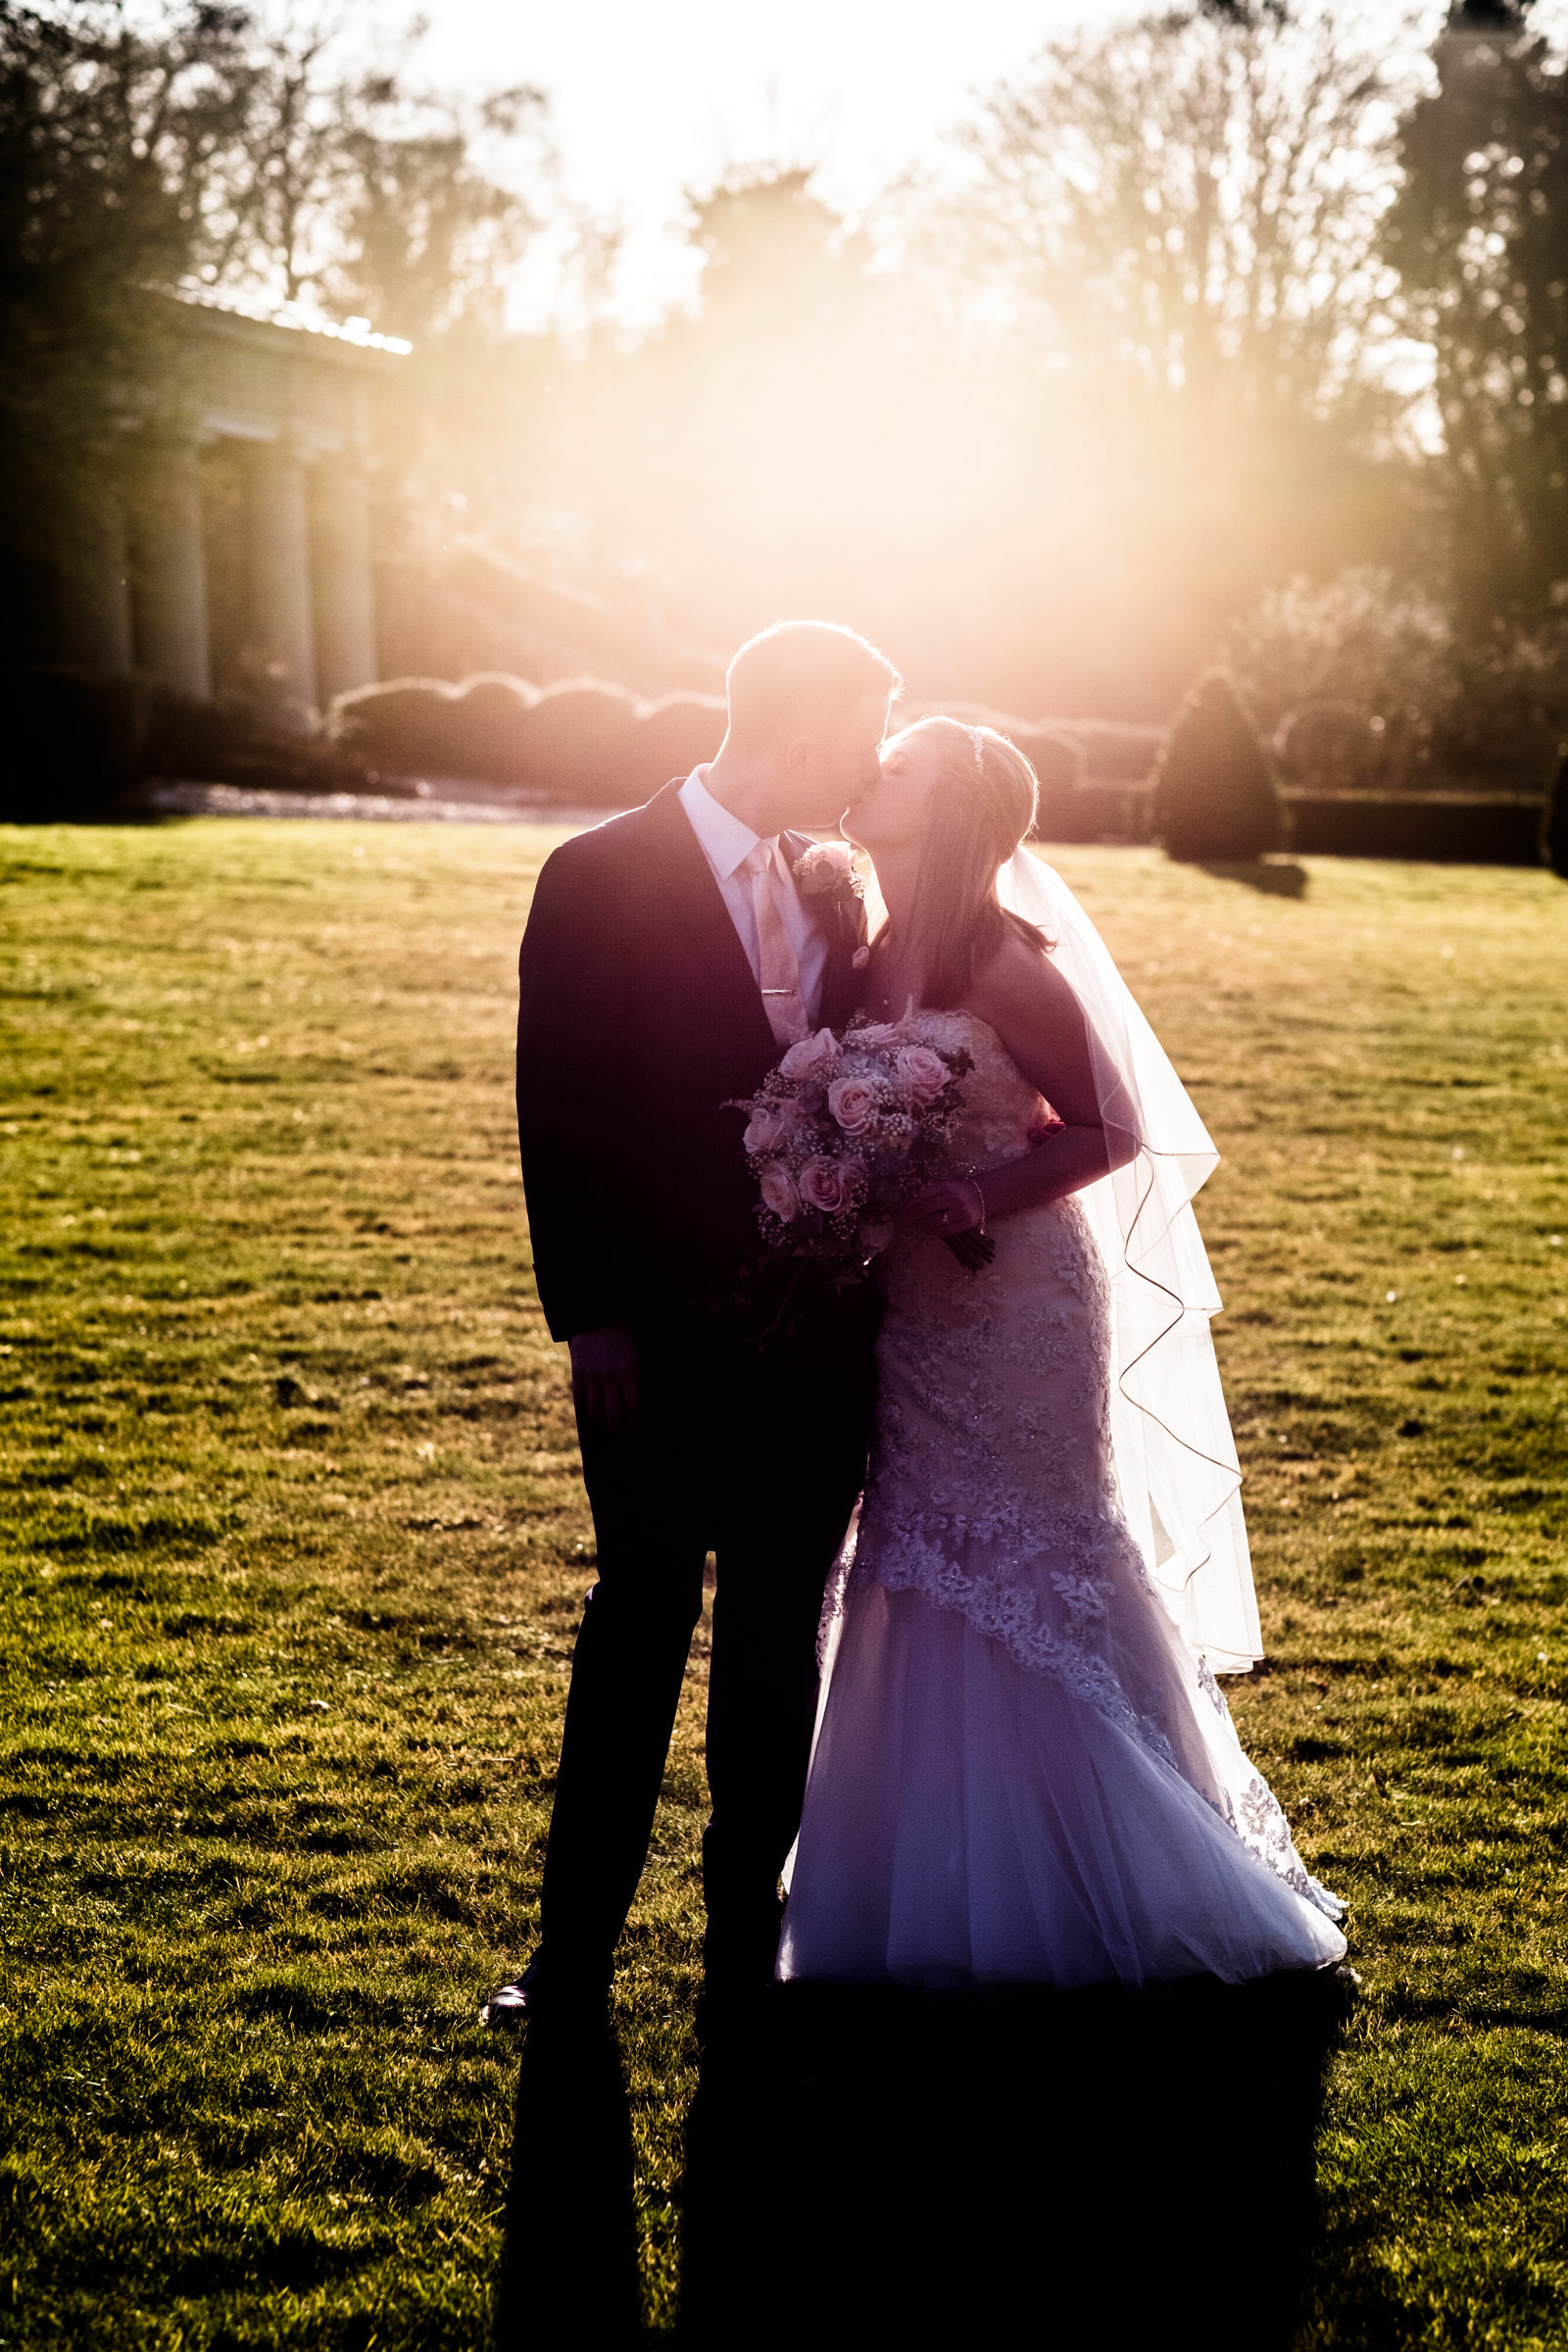 Donna & Nick's Wedding at Wotton House in Dorking 019.jpg